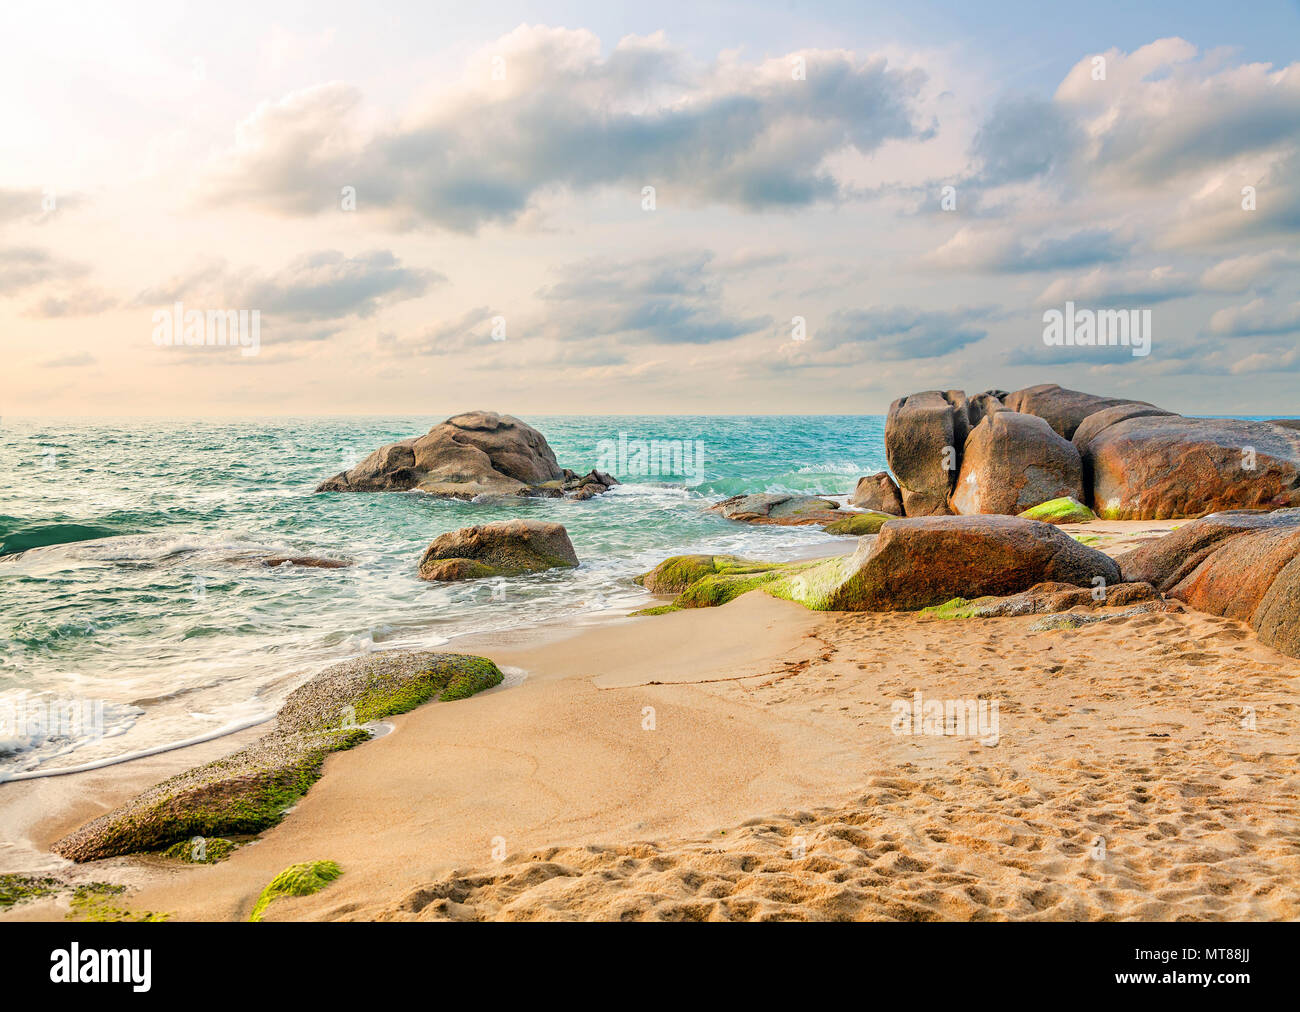 Sunrise on Lamai Beach on Koh Samui in Thailand. - Stock Image